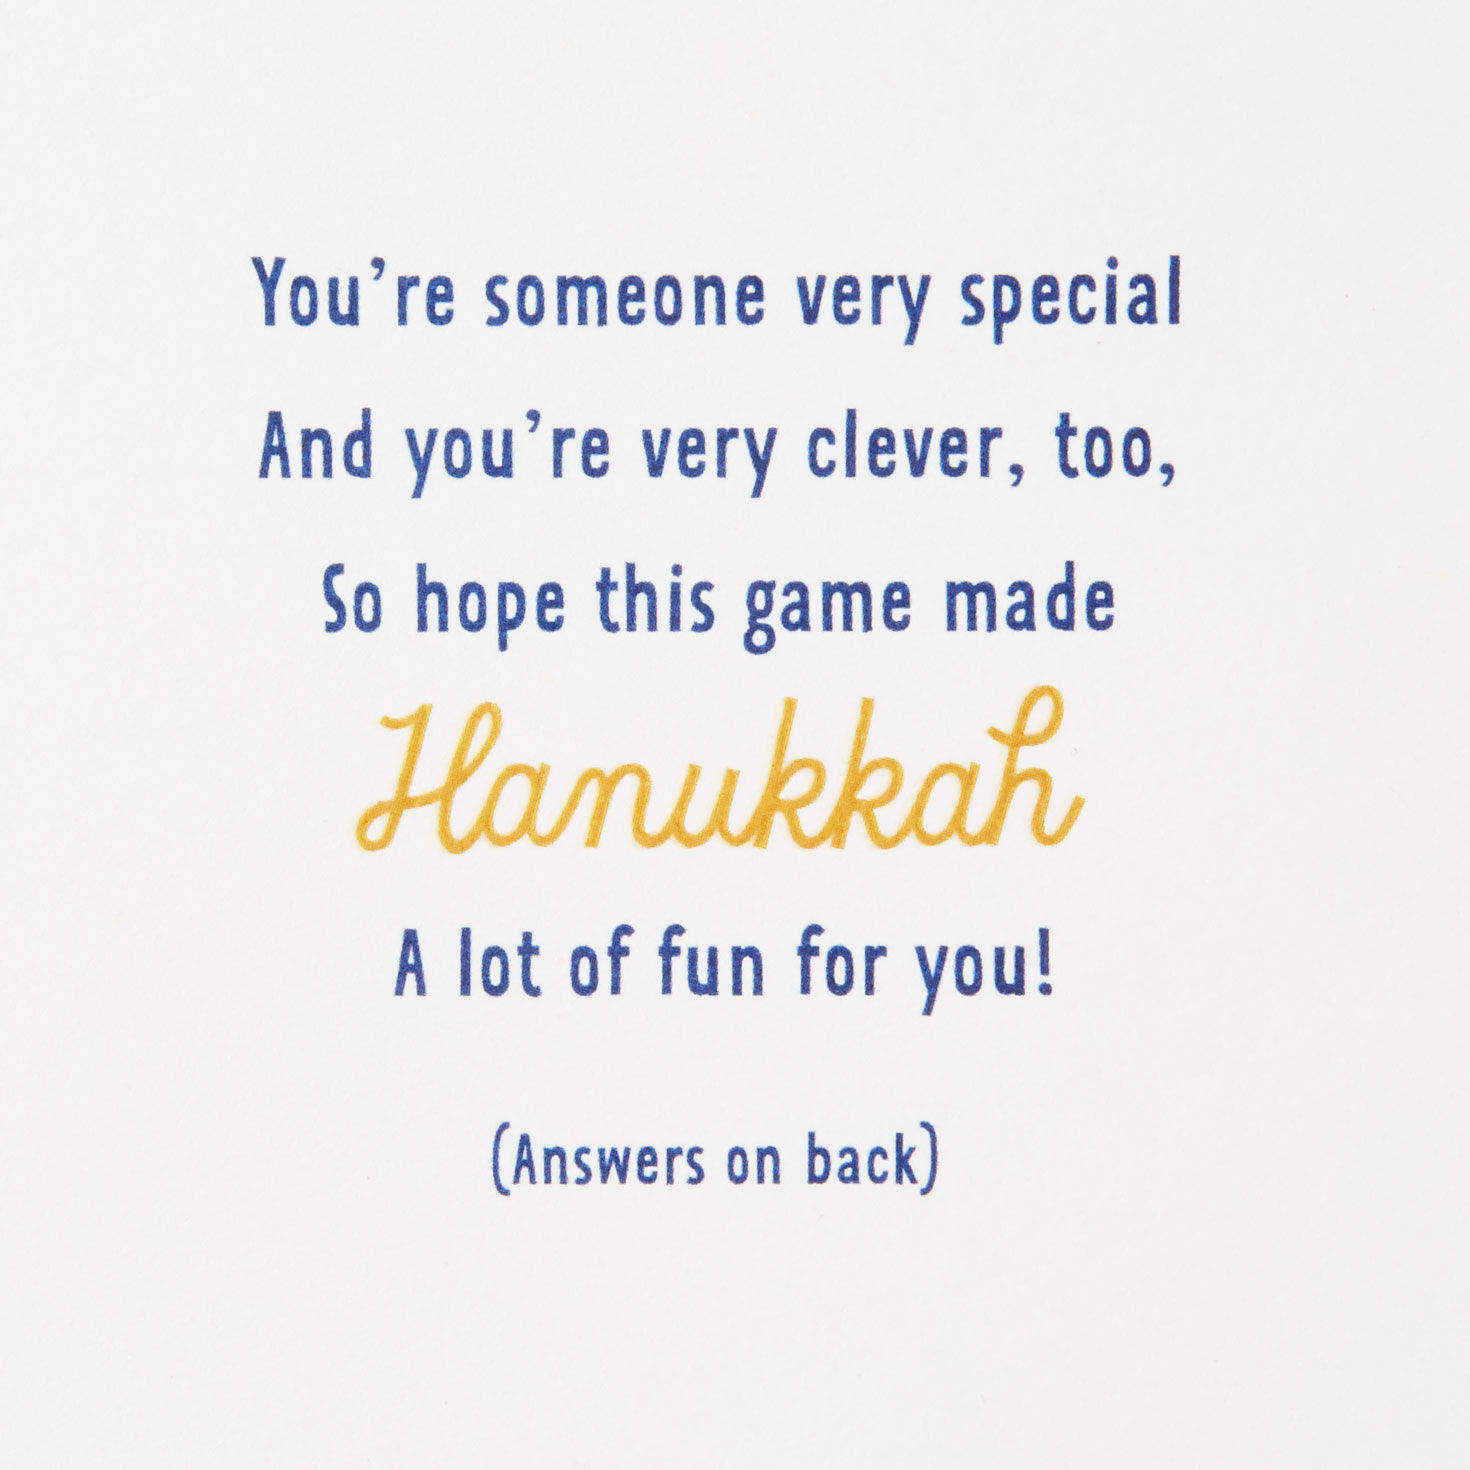 photograph regarding Printable Hanukkah Cards named Hanukkah Playing cards Hallmark